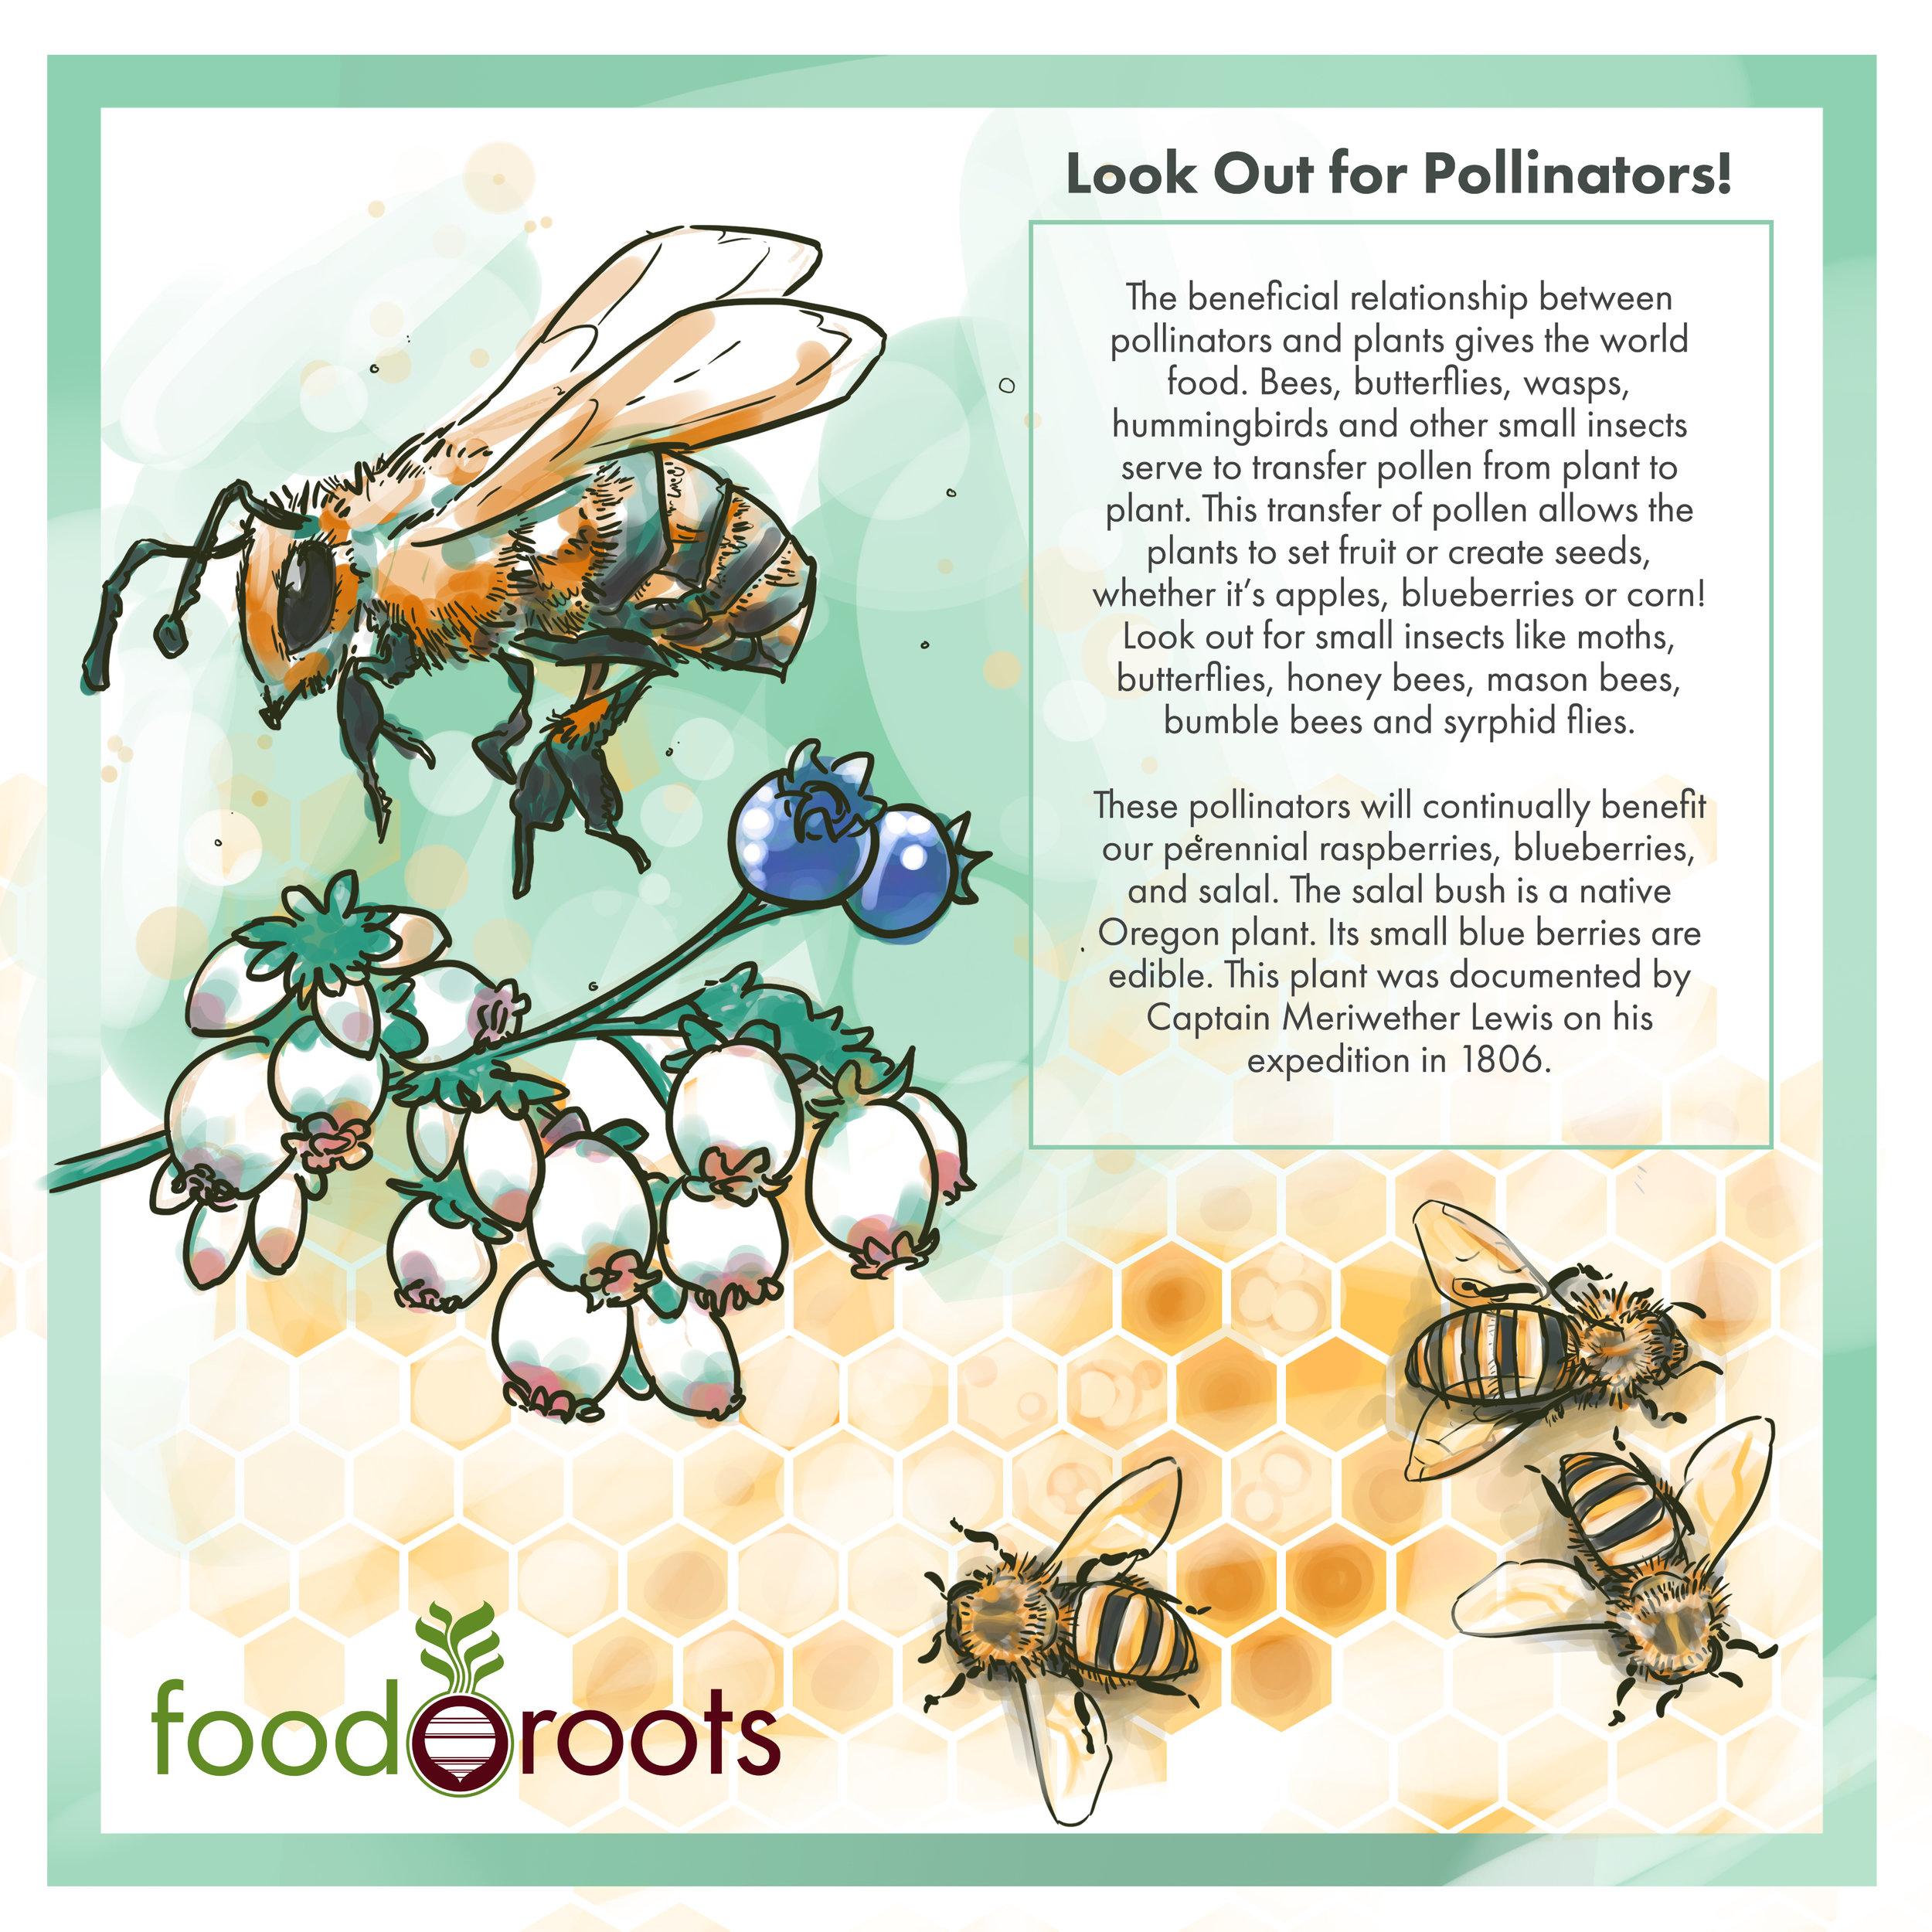 pollinator-03.jpg